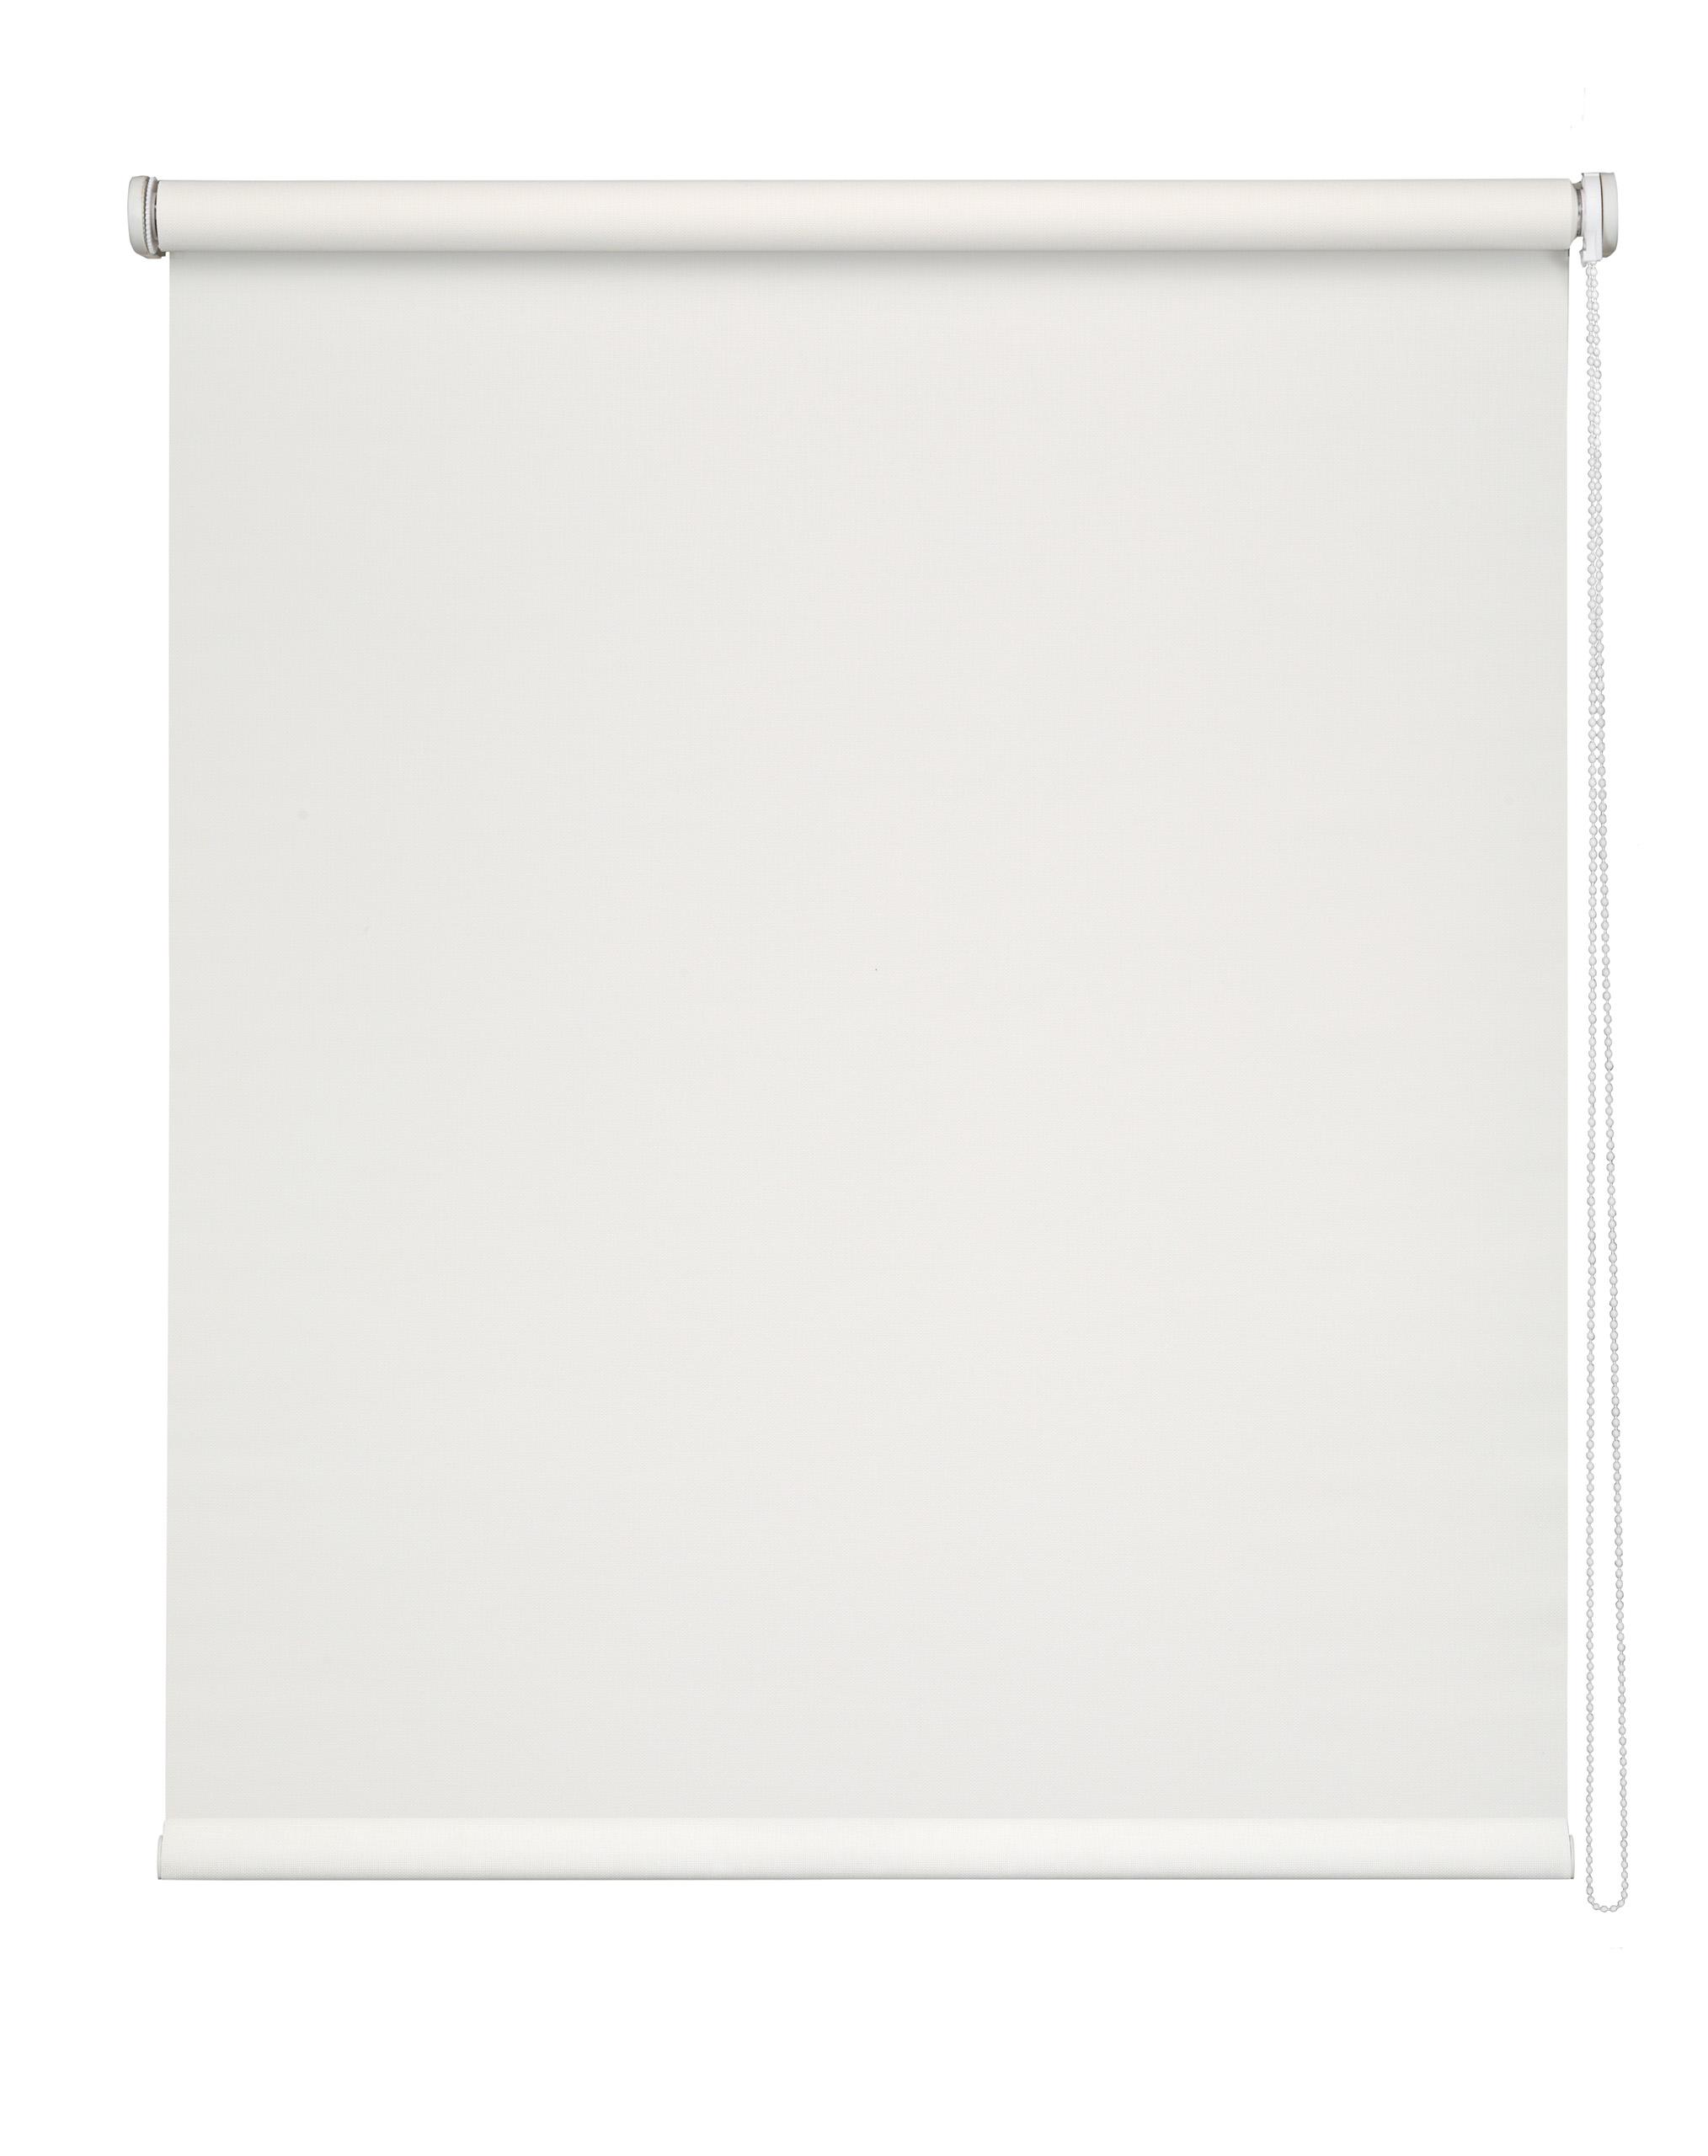 Store Enrouleur voile Screen - Blanc - 180 x 250 cm